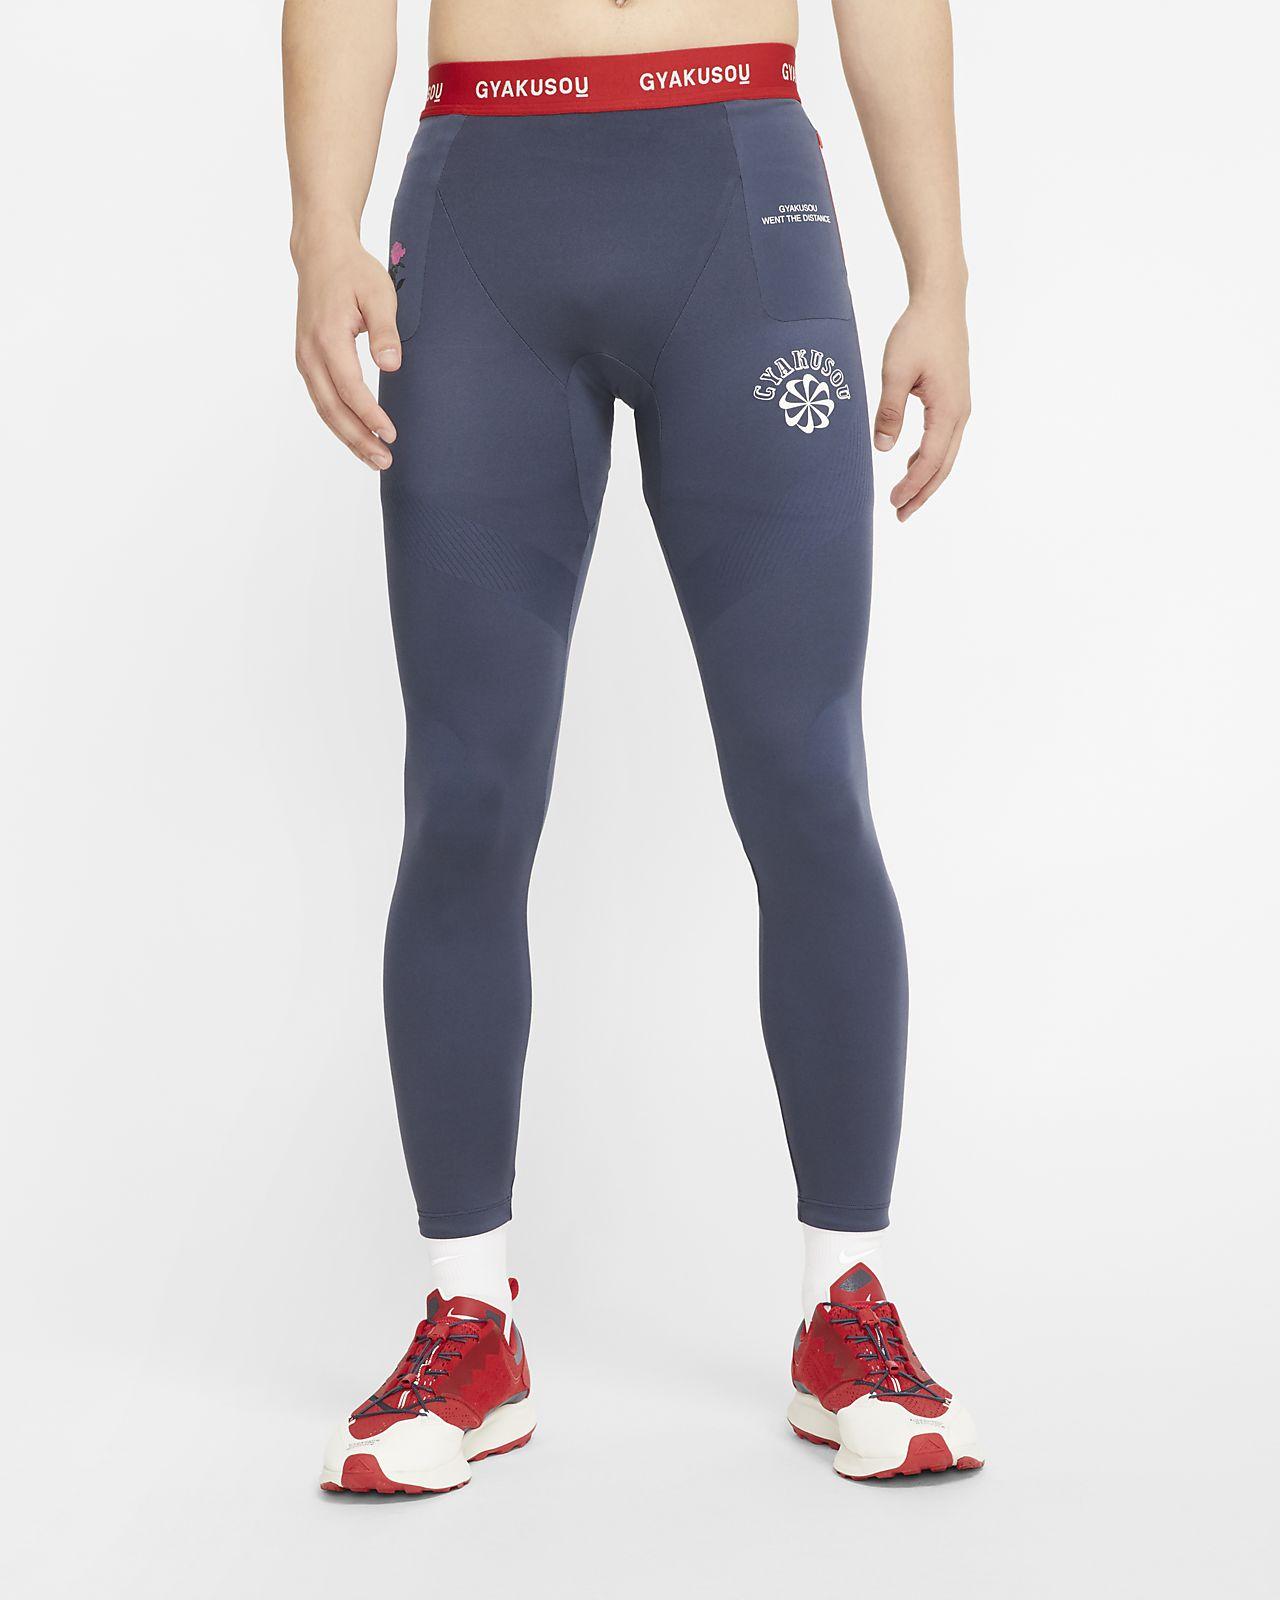 Nike x Gyakusou Helix Tights